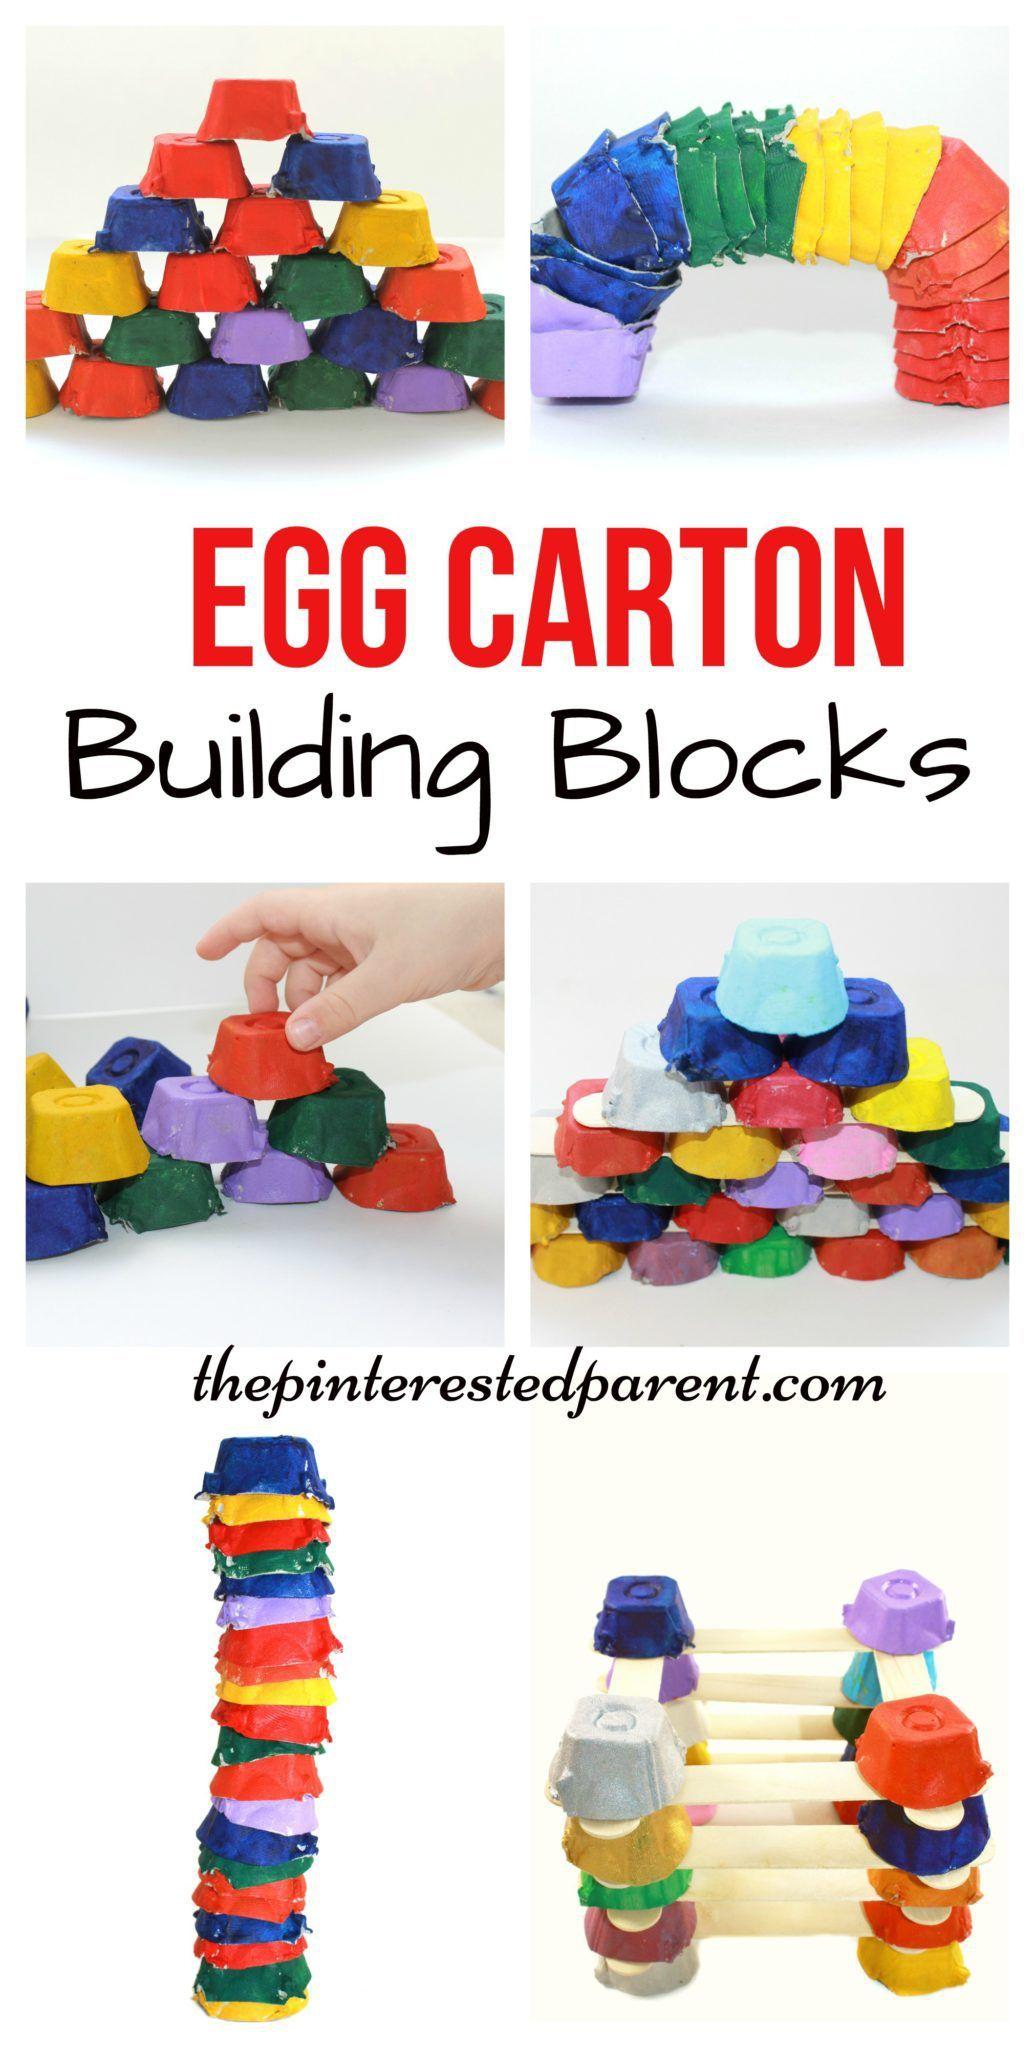 egg carton building blocks kreative spielideen f r kinder. Black Bedroom Furniture Sets. Home Design Ideas